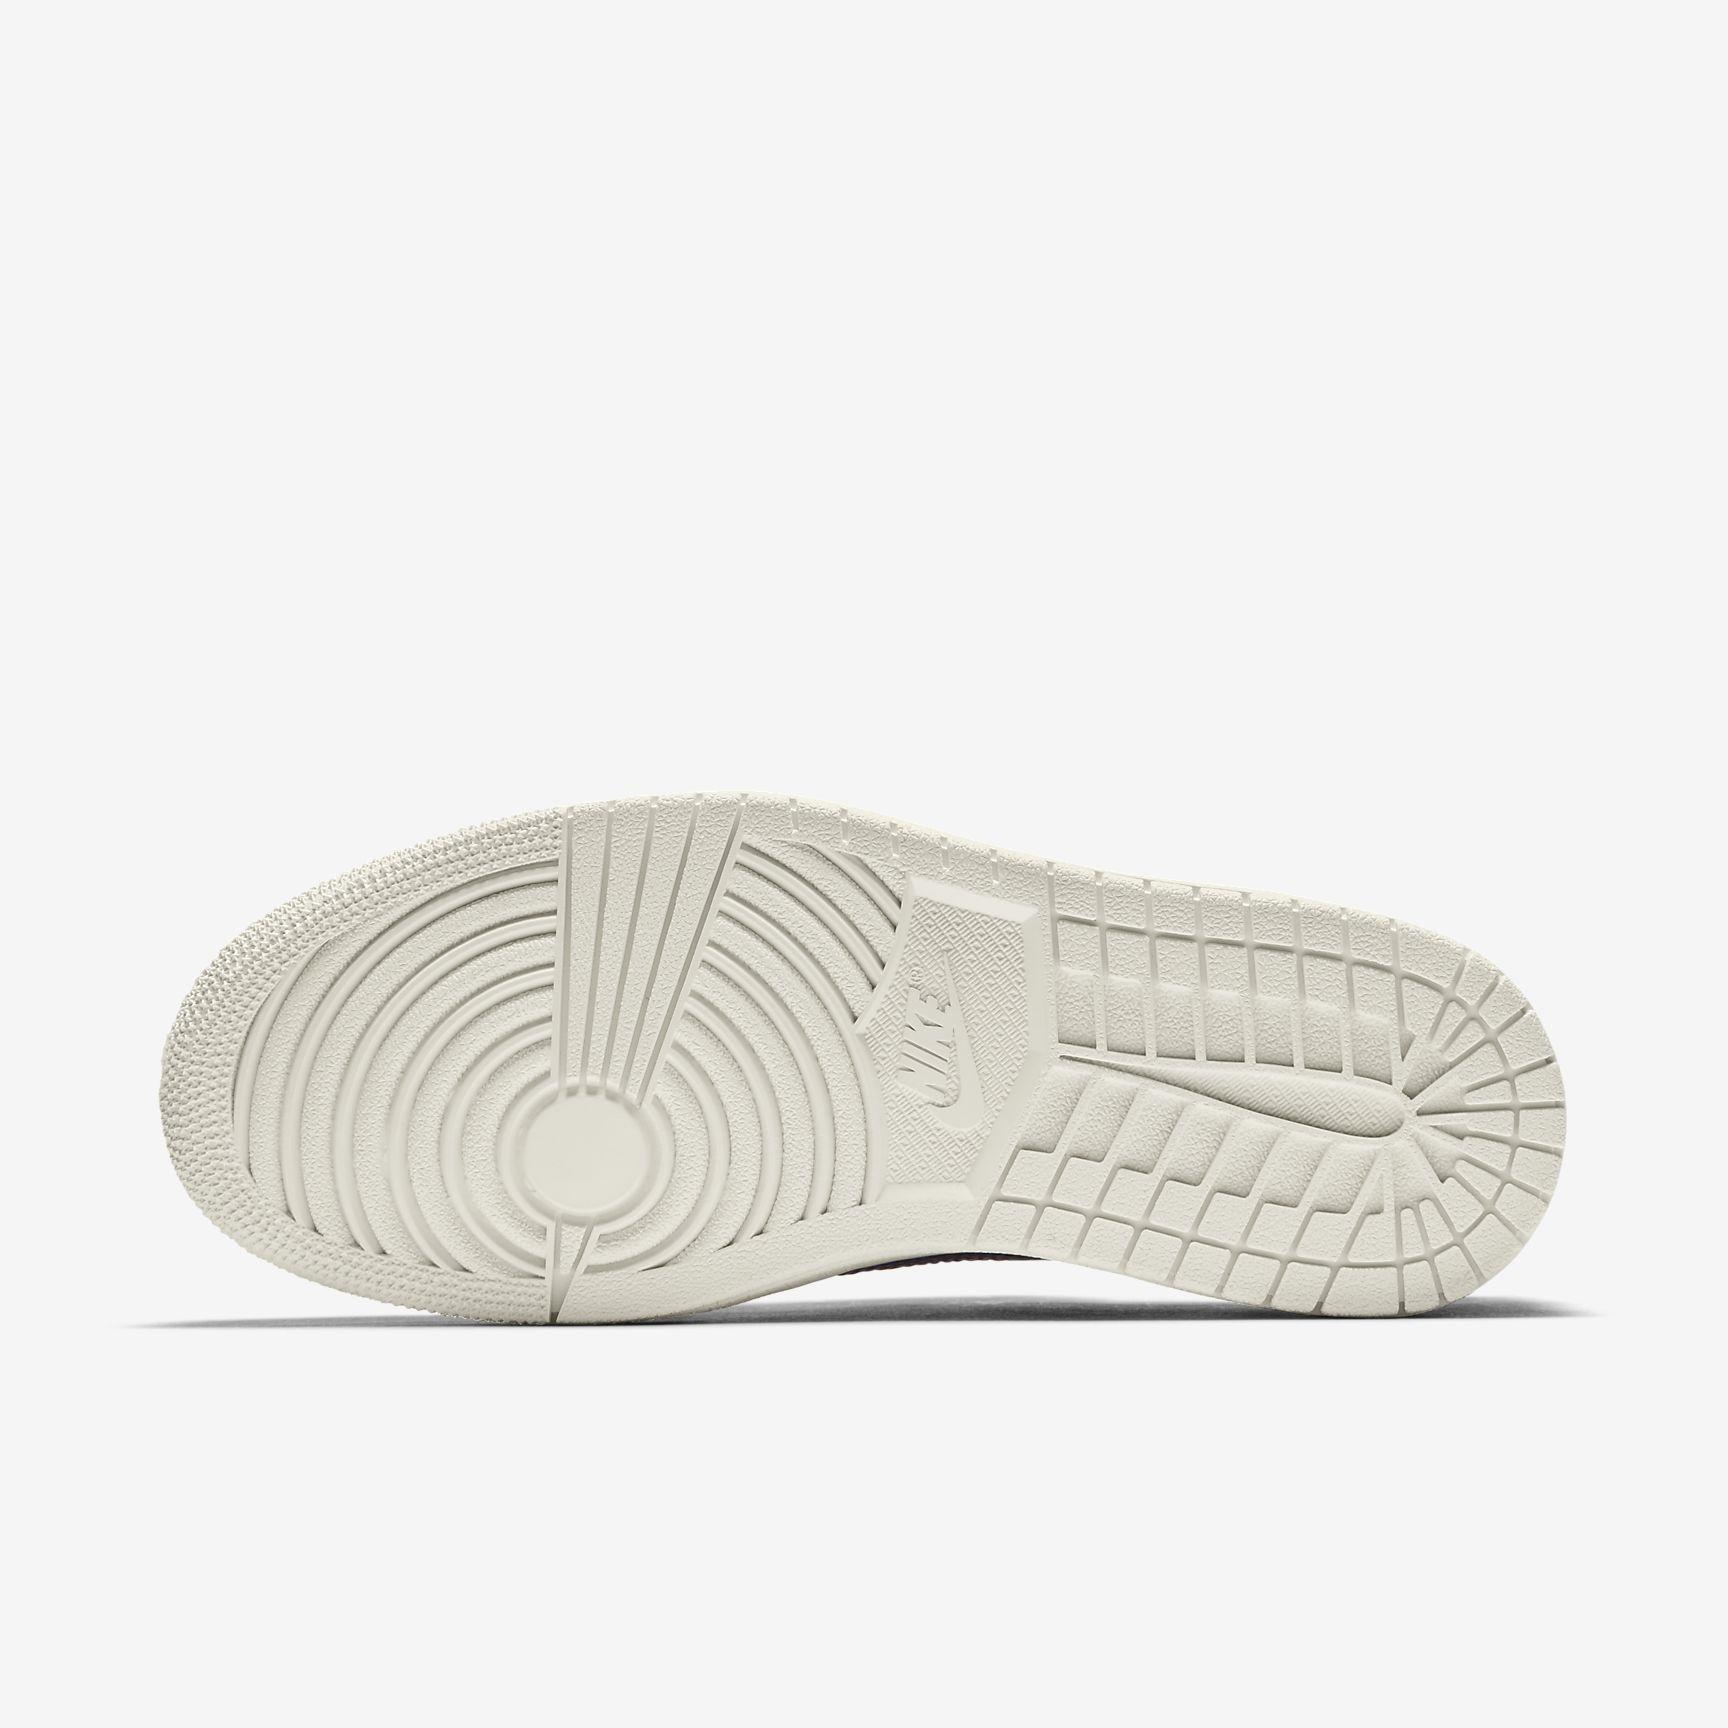 Nike耐克 AIR JORDAN 1 RETRO 复刻运动鞋 AO1935